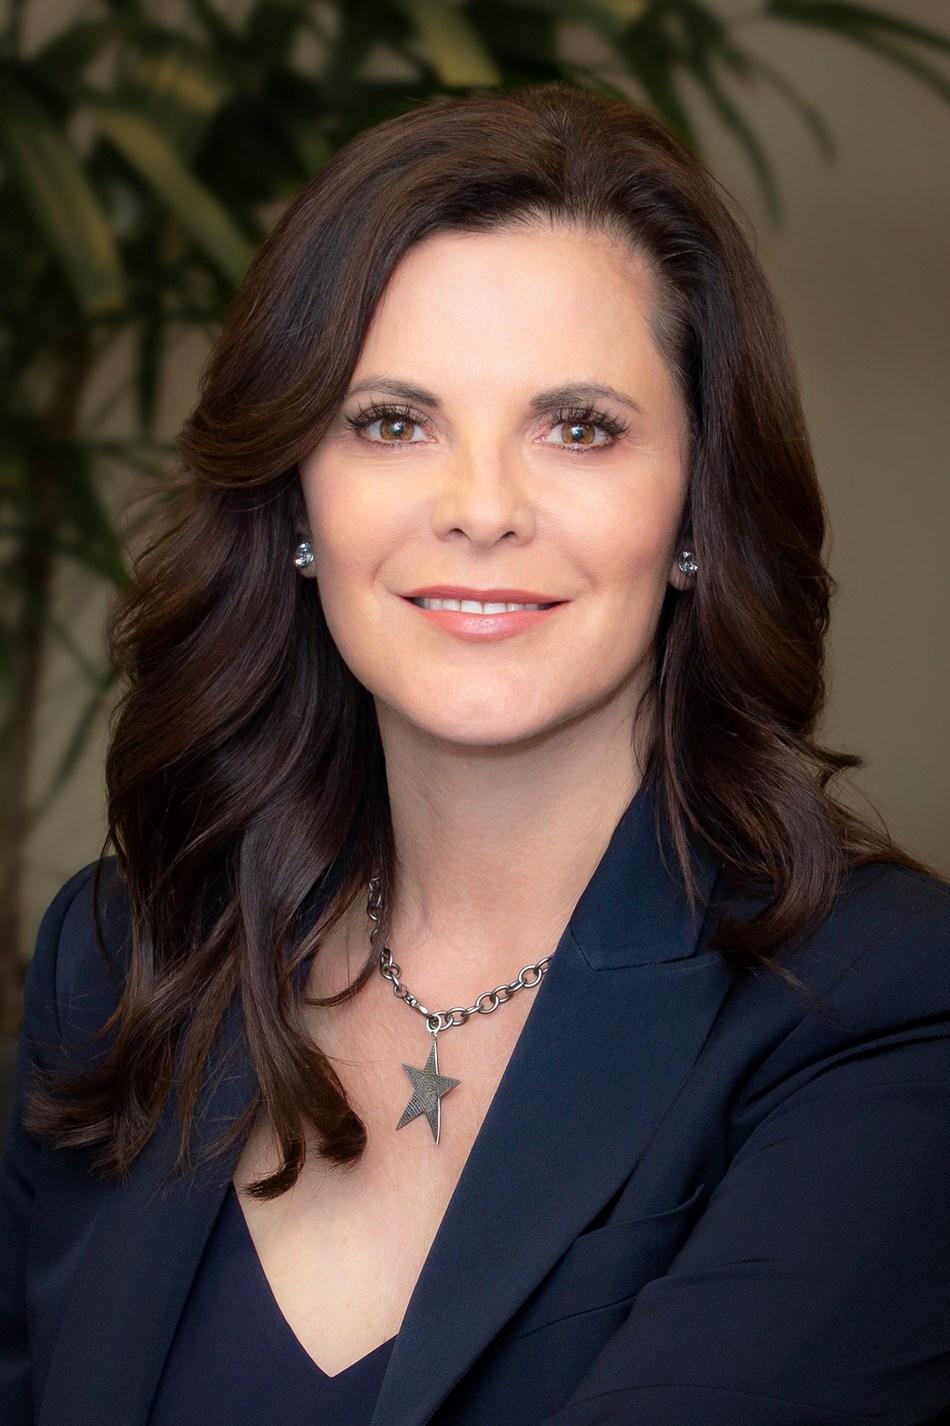 Patty Arvielo, presidenta de New American Funding (PRNewsfoto/New American Funding)